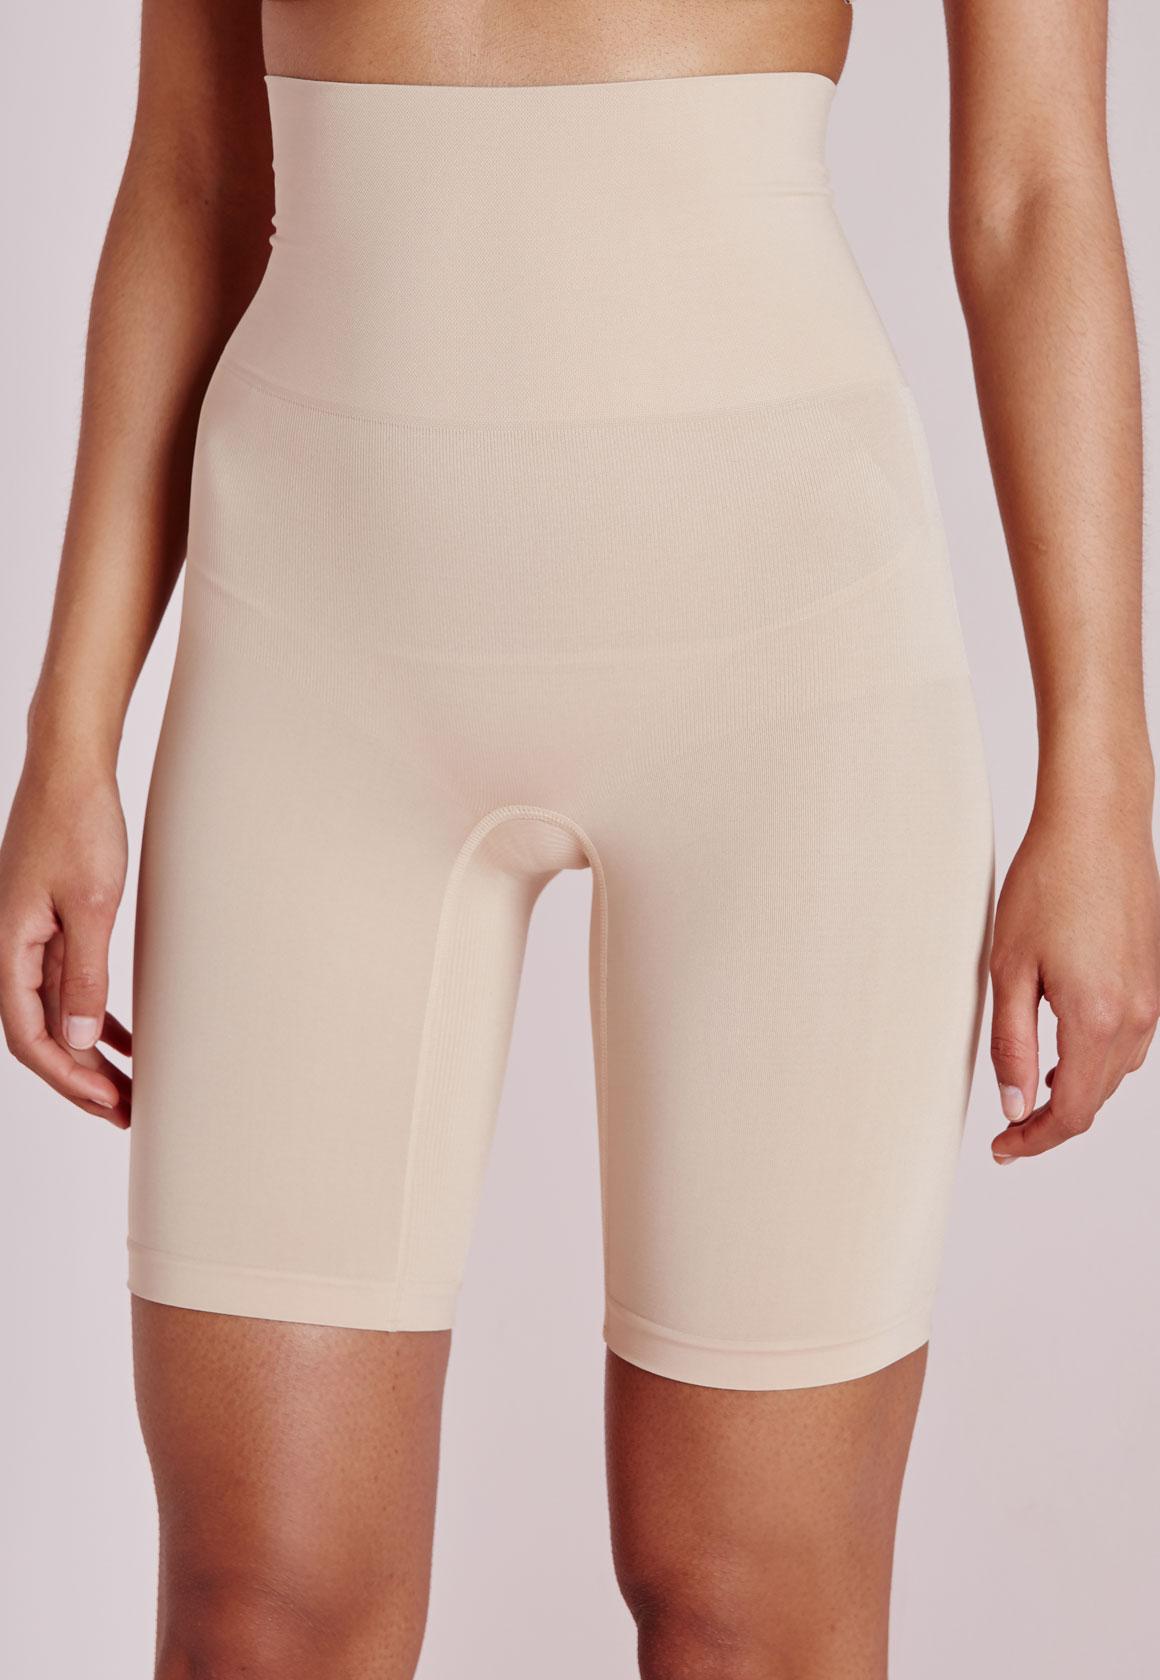 Fashion Shop - Nude Shapewear Shorts